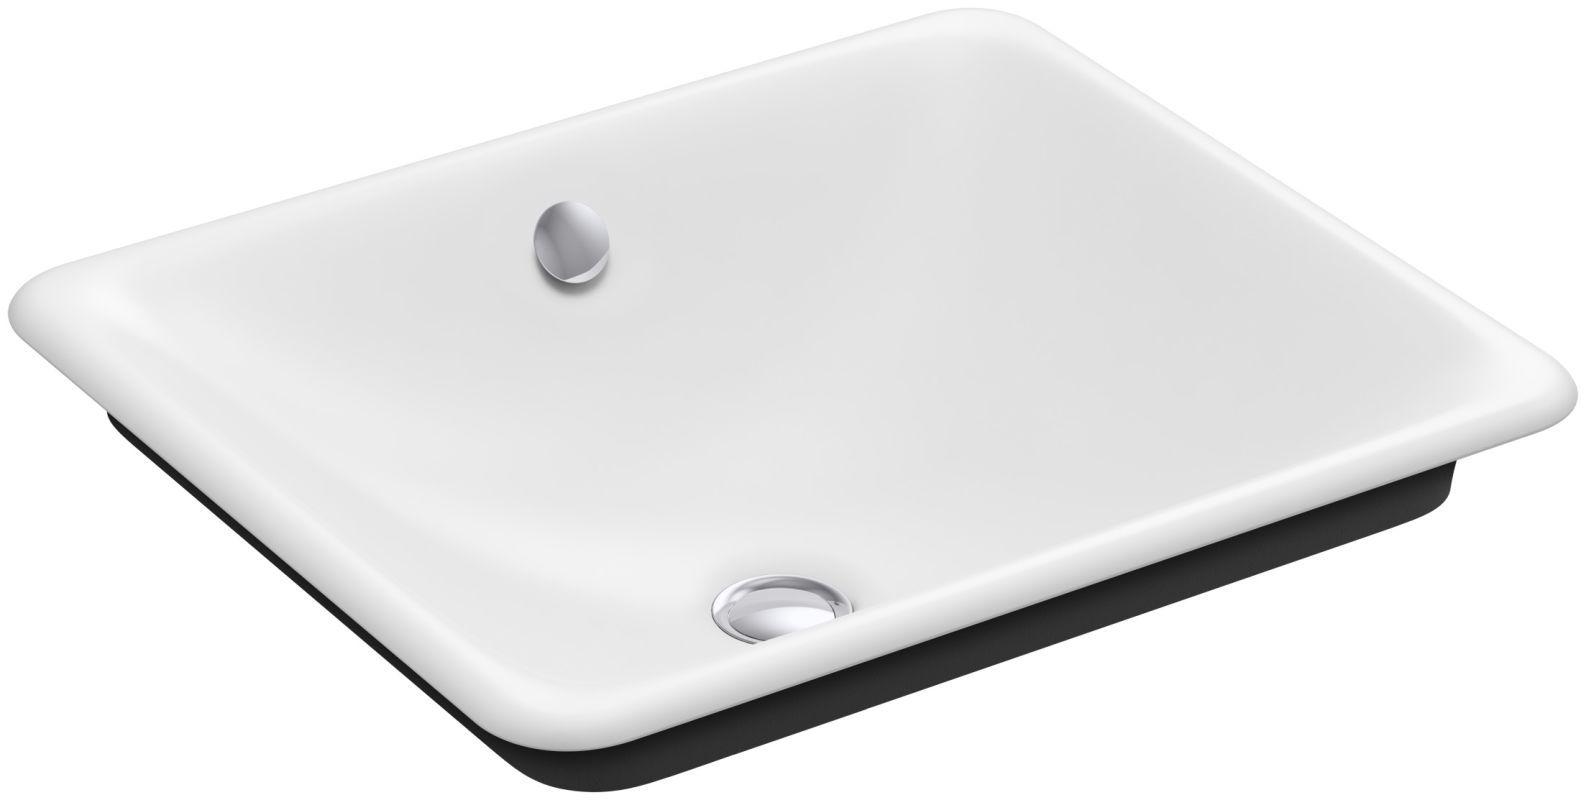 "Kohler K-5400-P5 Iron Plains 19-9/16"" Drop In Enameled Cast Iron Bathroom Sink w White Fixture Lavatory Sink Cast Iron"